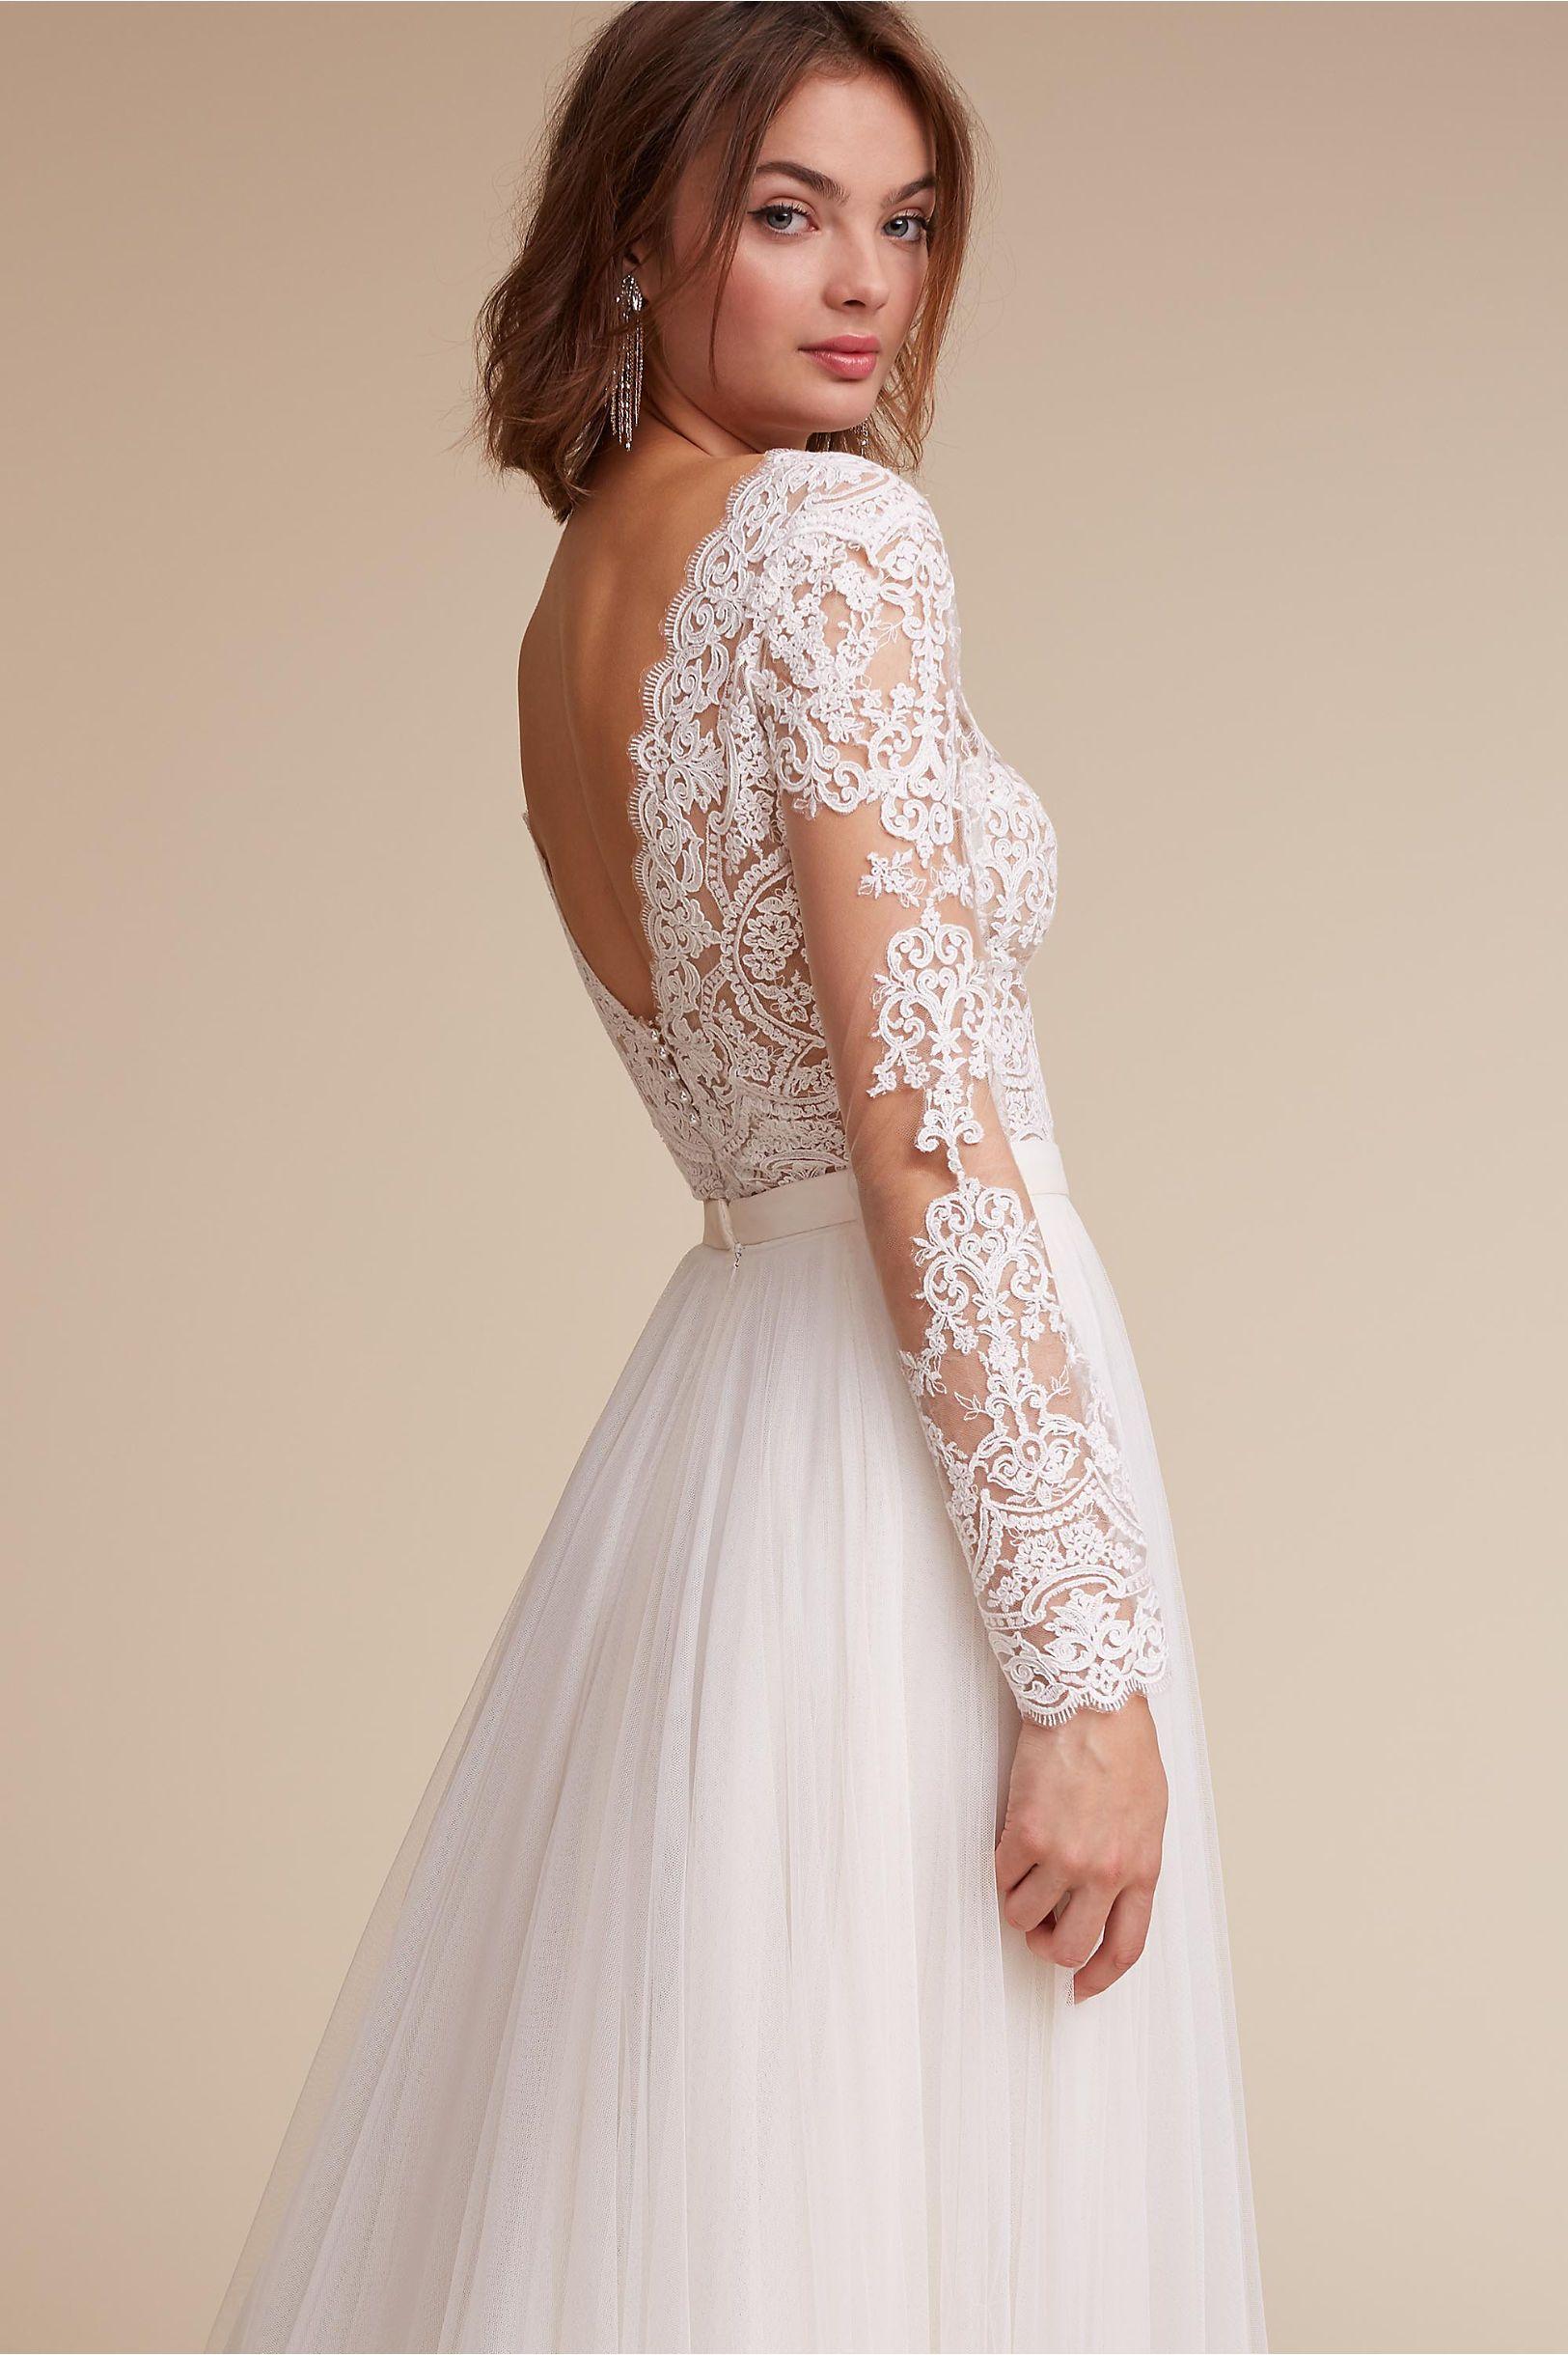 Bhldn rhea bodysuit in bride bridal separates tops bhldn bhldn rhea bodysuit in bride bridal separates tops bhldn ombrellifo Choice Image